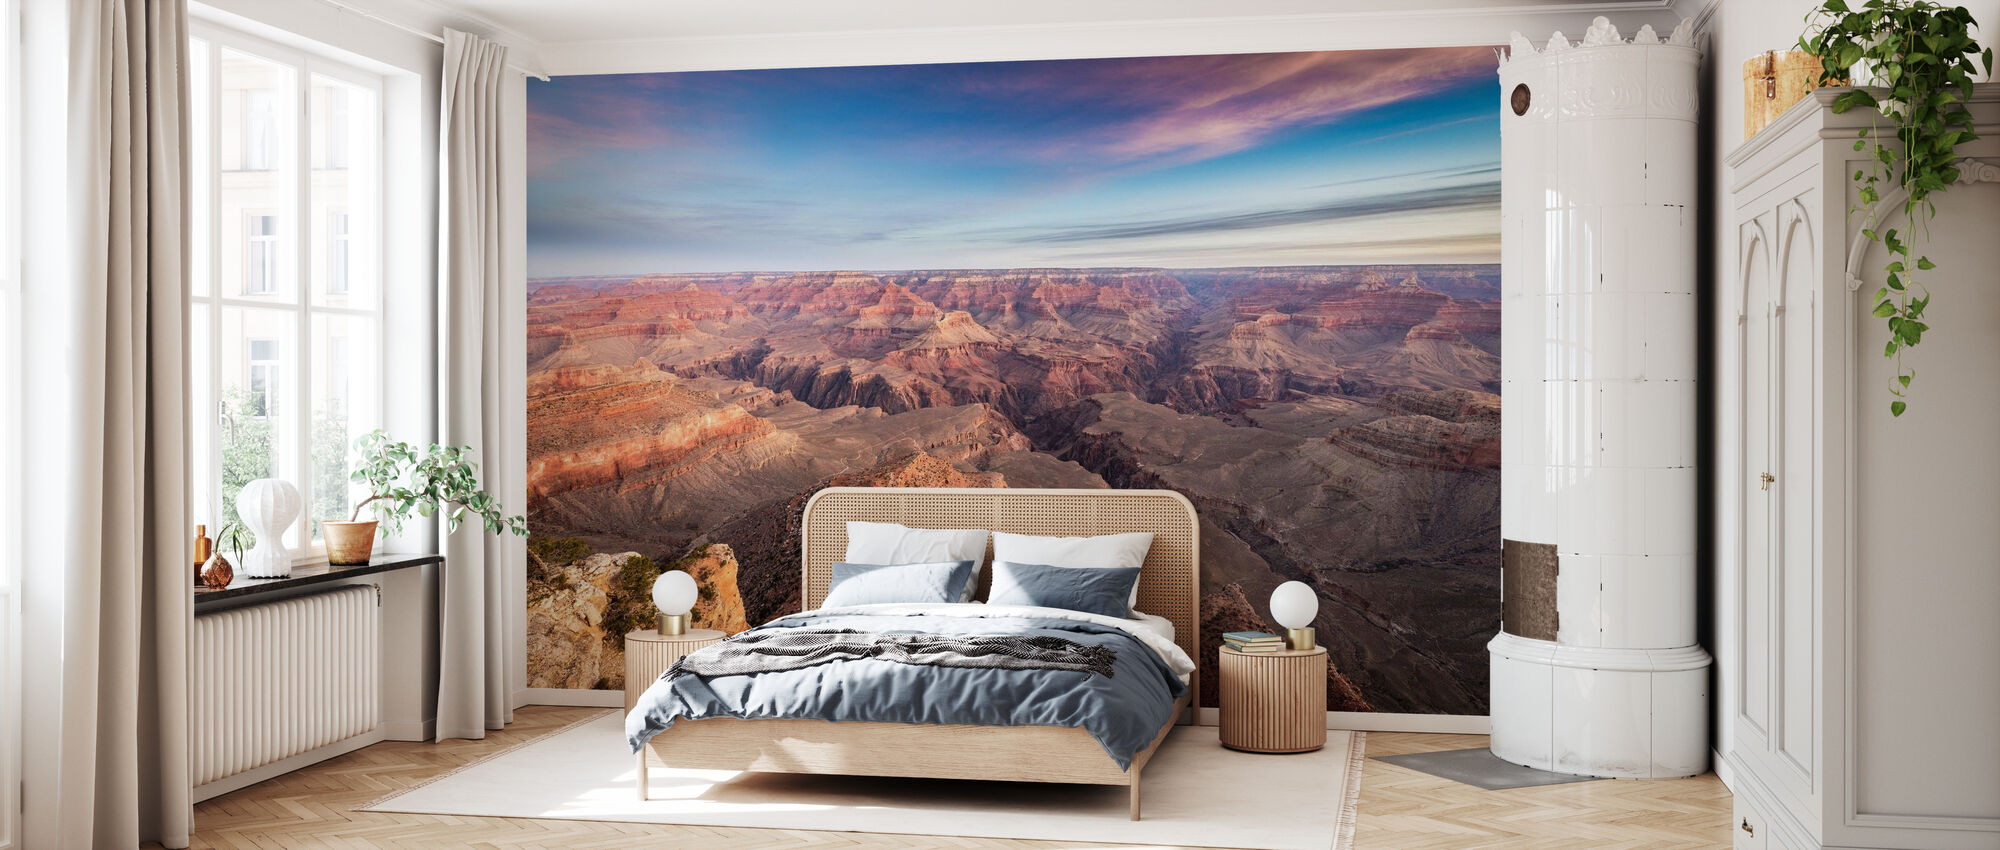 Grand Canyon National Park - Wallpaper - Bedroom